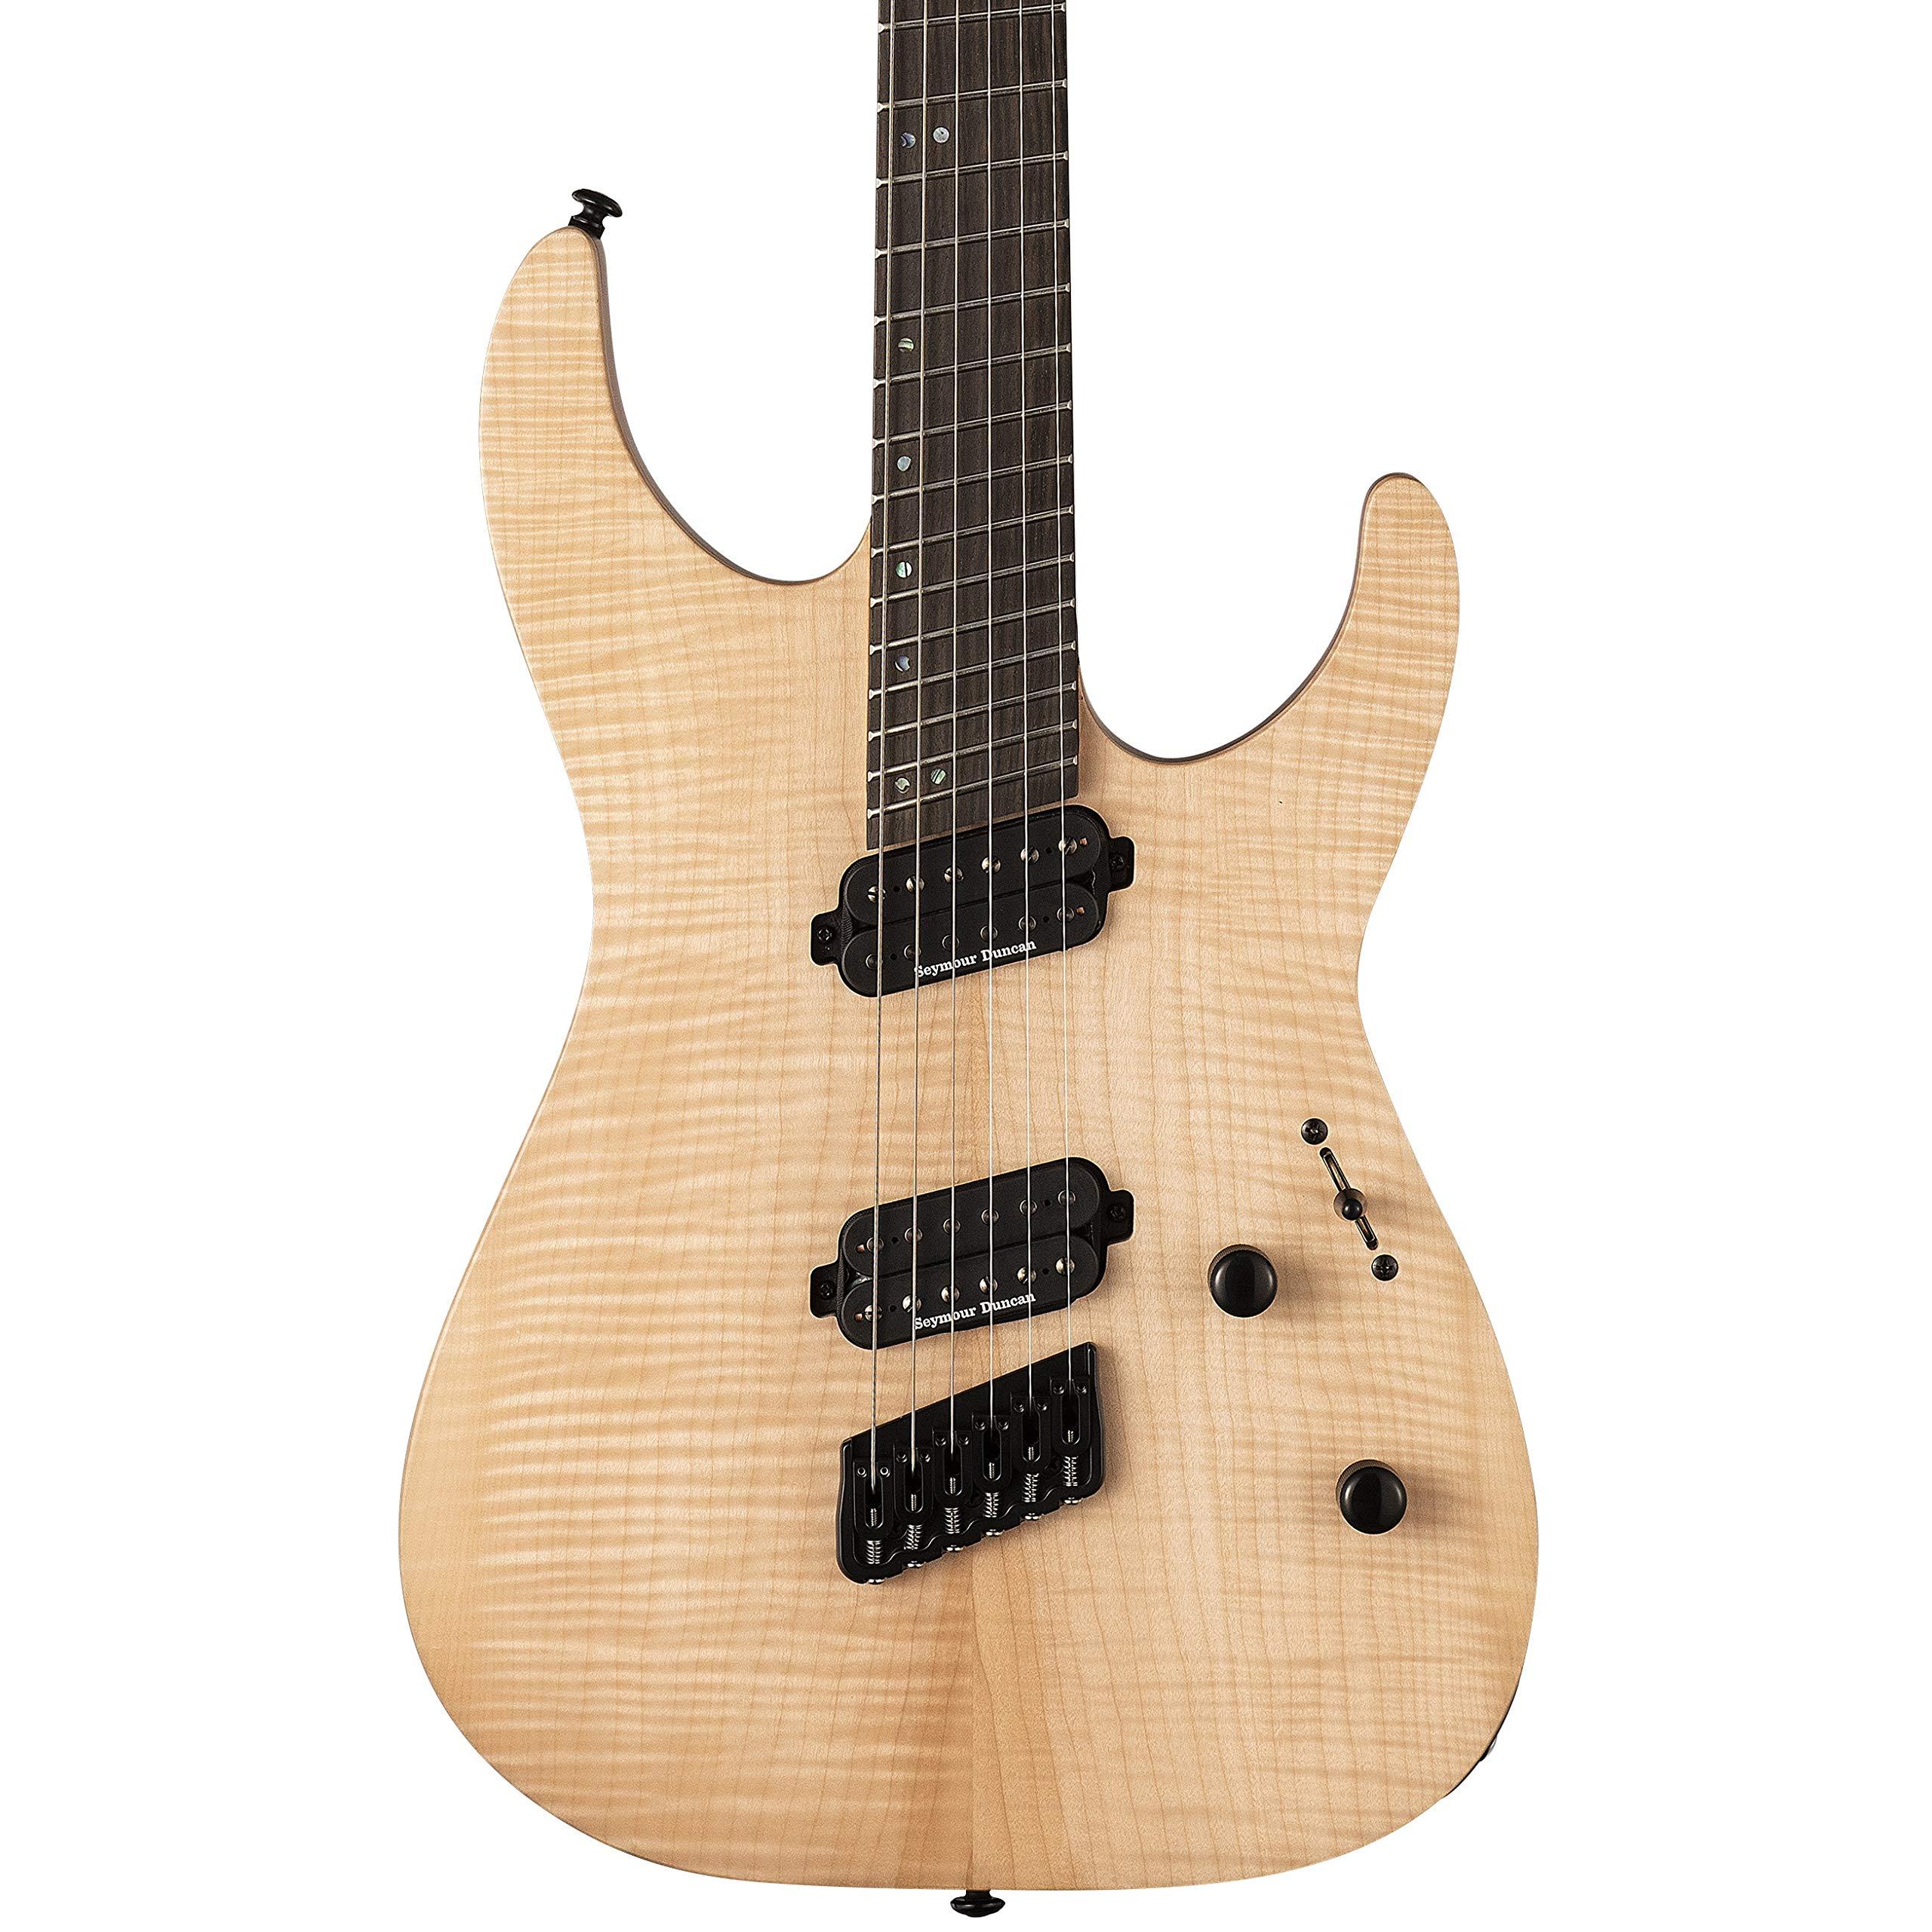 Cheap ESP LTD M-1000 Multi-Scale Electric Guitar Natural Satin Black Friday & Cyber Monday 2019